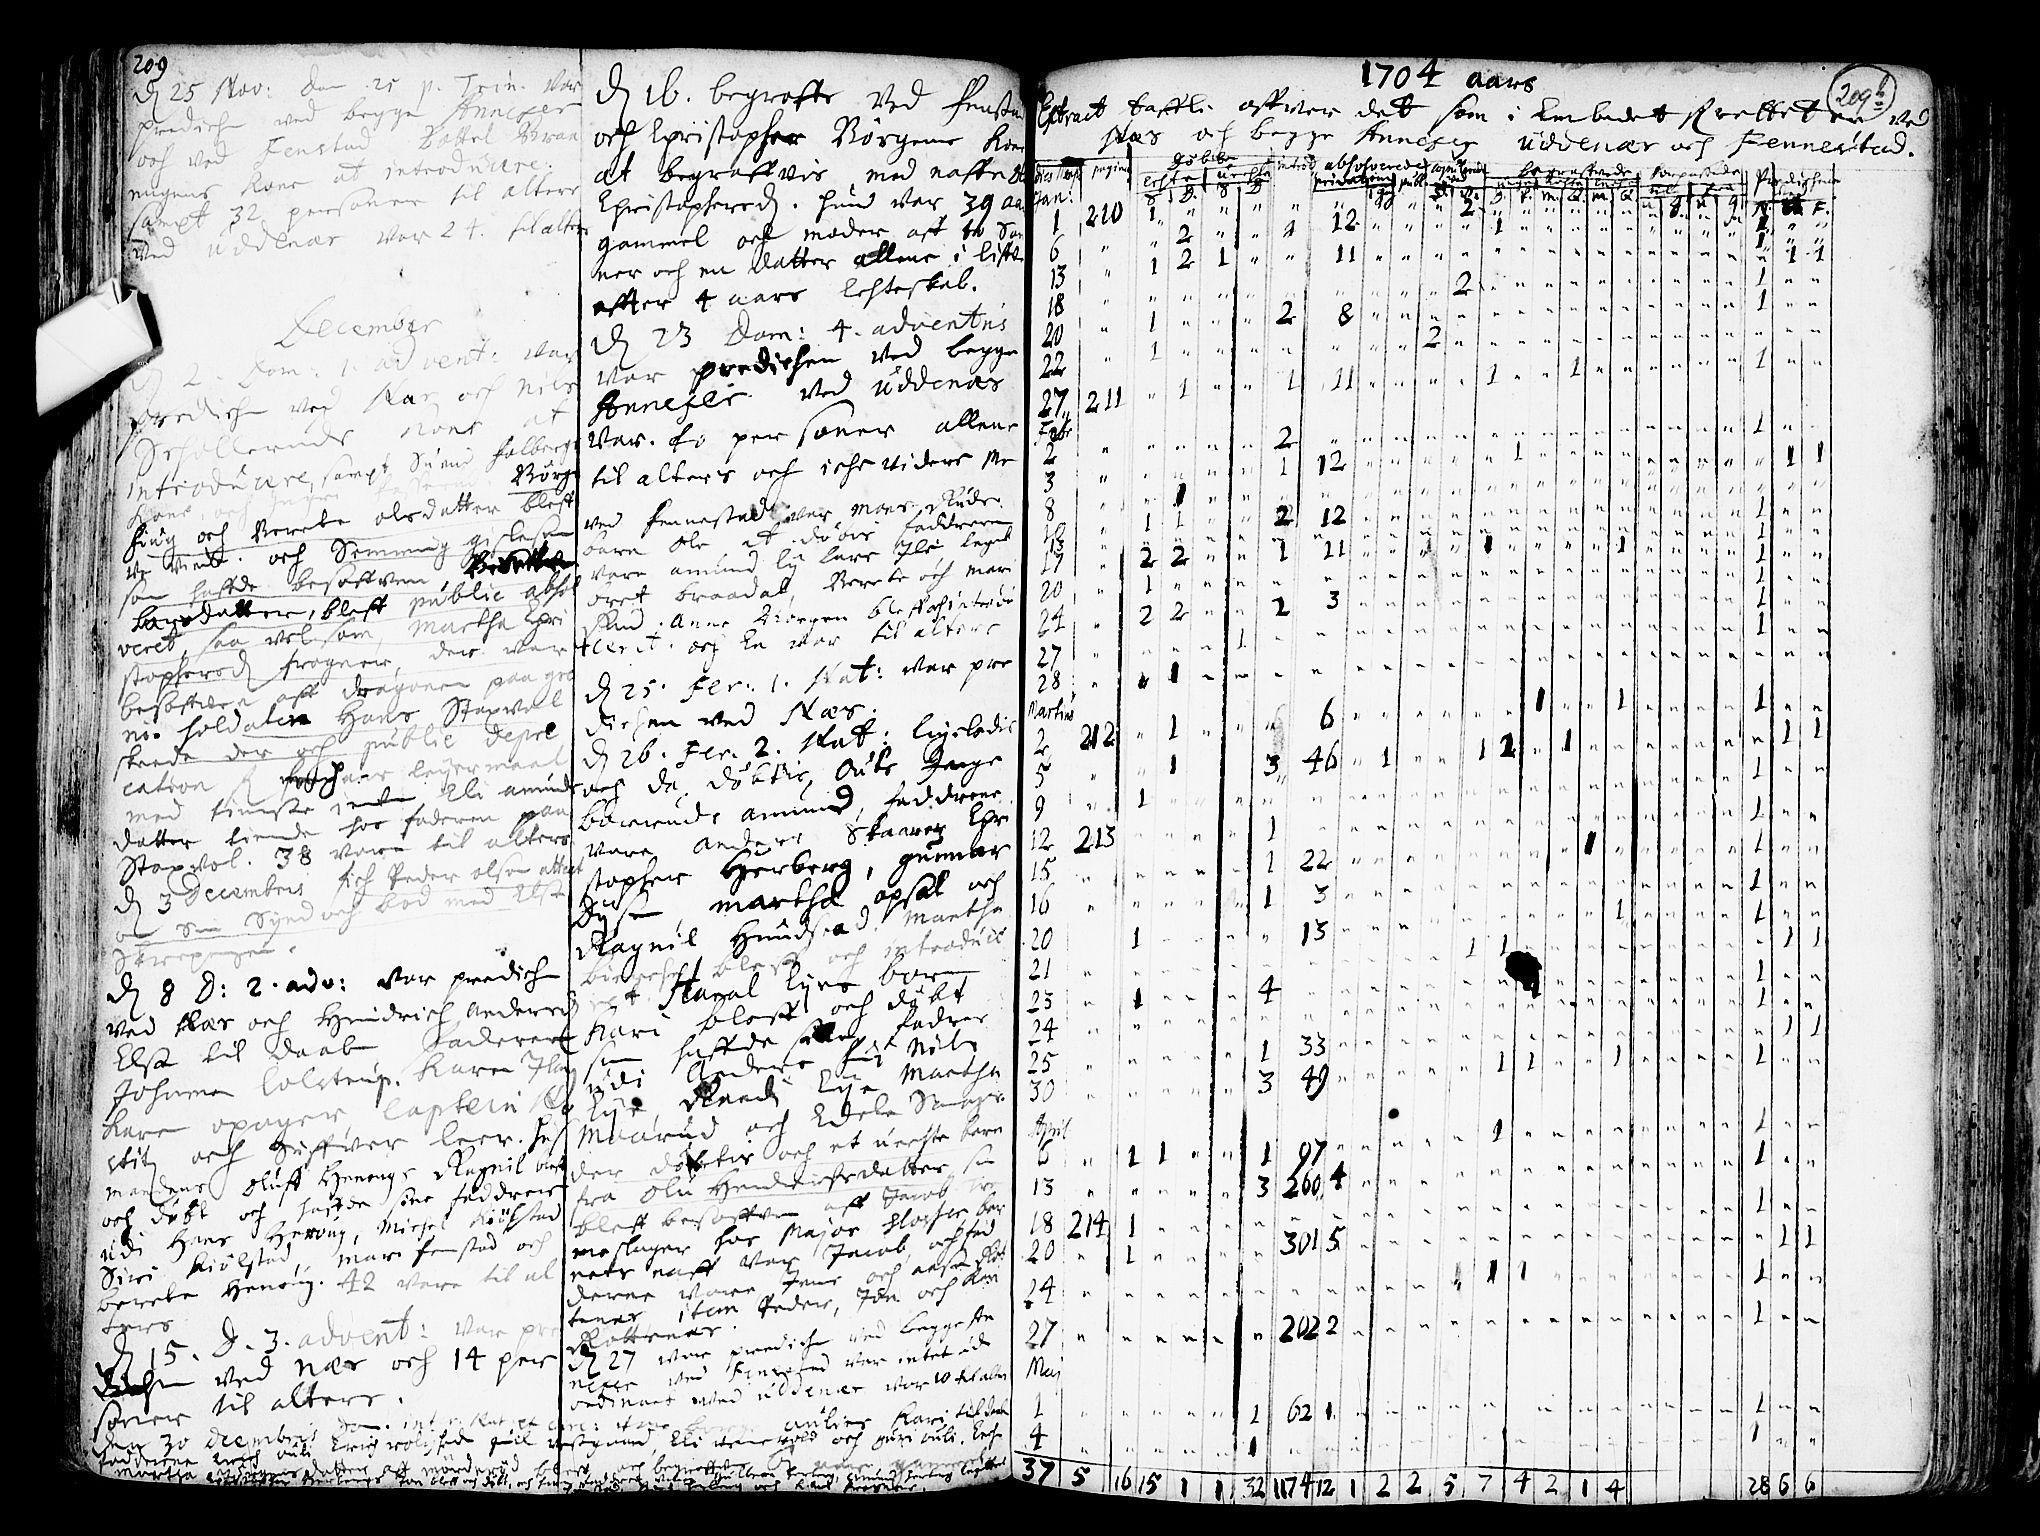 SAO, Nes prestekontor Kirkebøker, F/Fa/L0001: Parish register (official) no. I 1, 1689-1716, p. 209a-209b